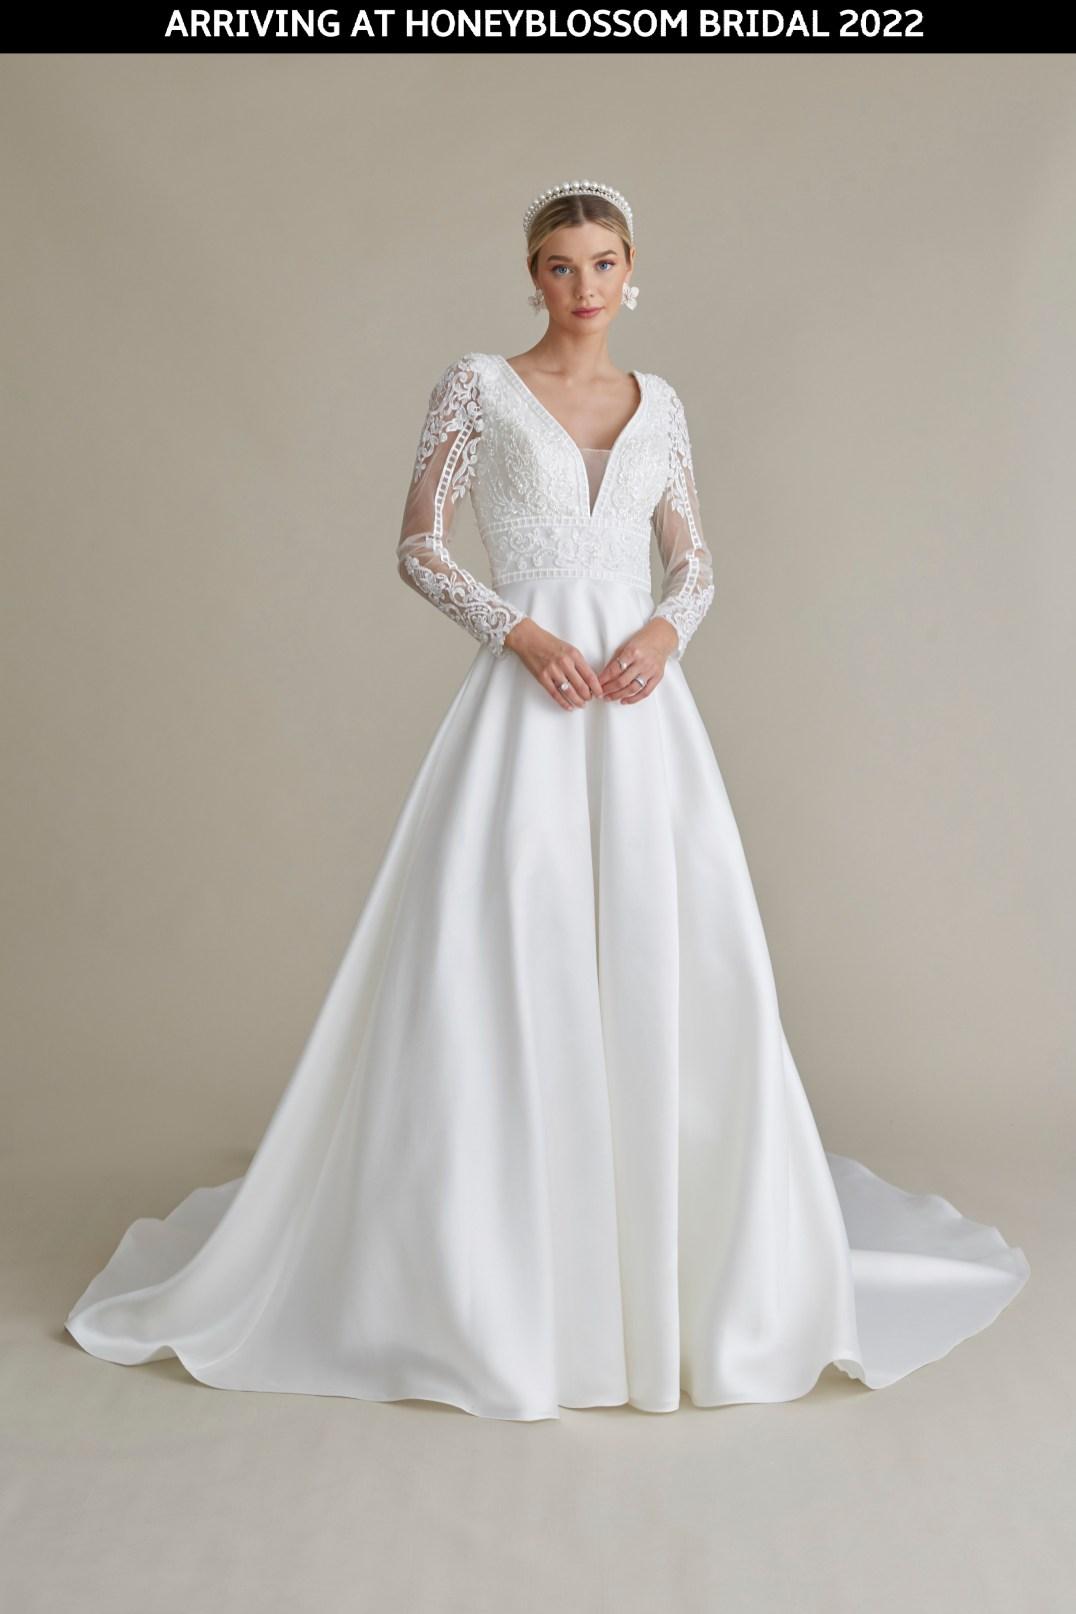 MiaMia Blair wedding gown arriving soon to Honeyblossom Bridal